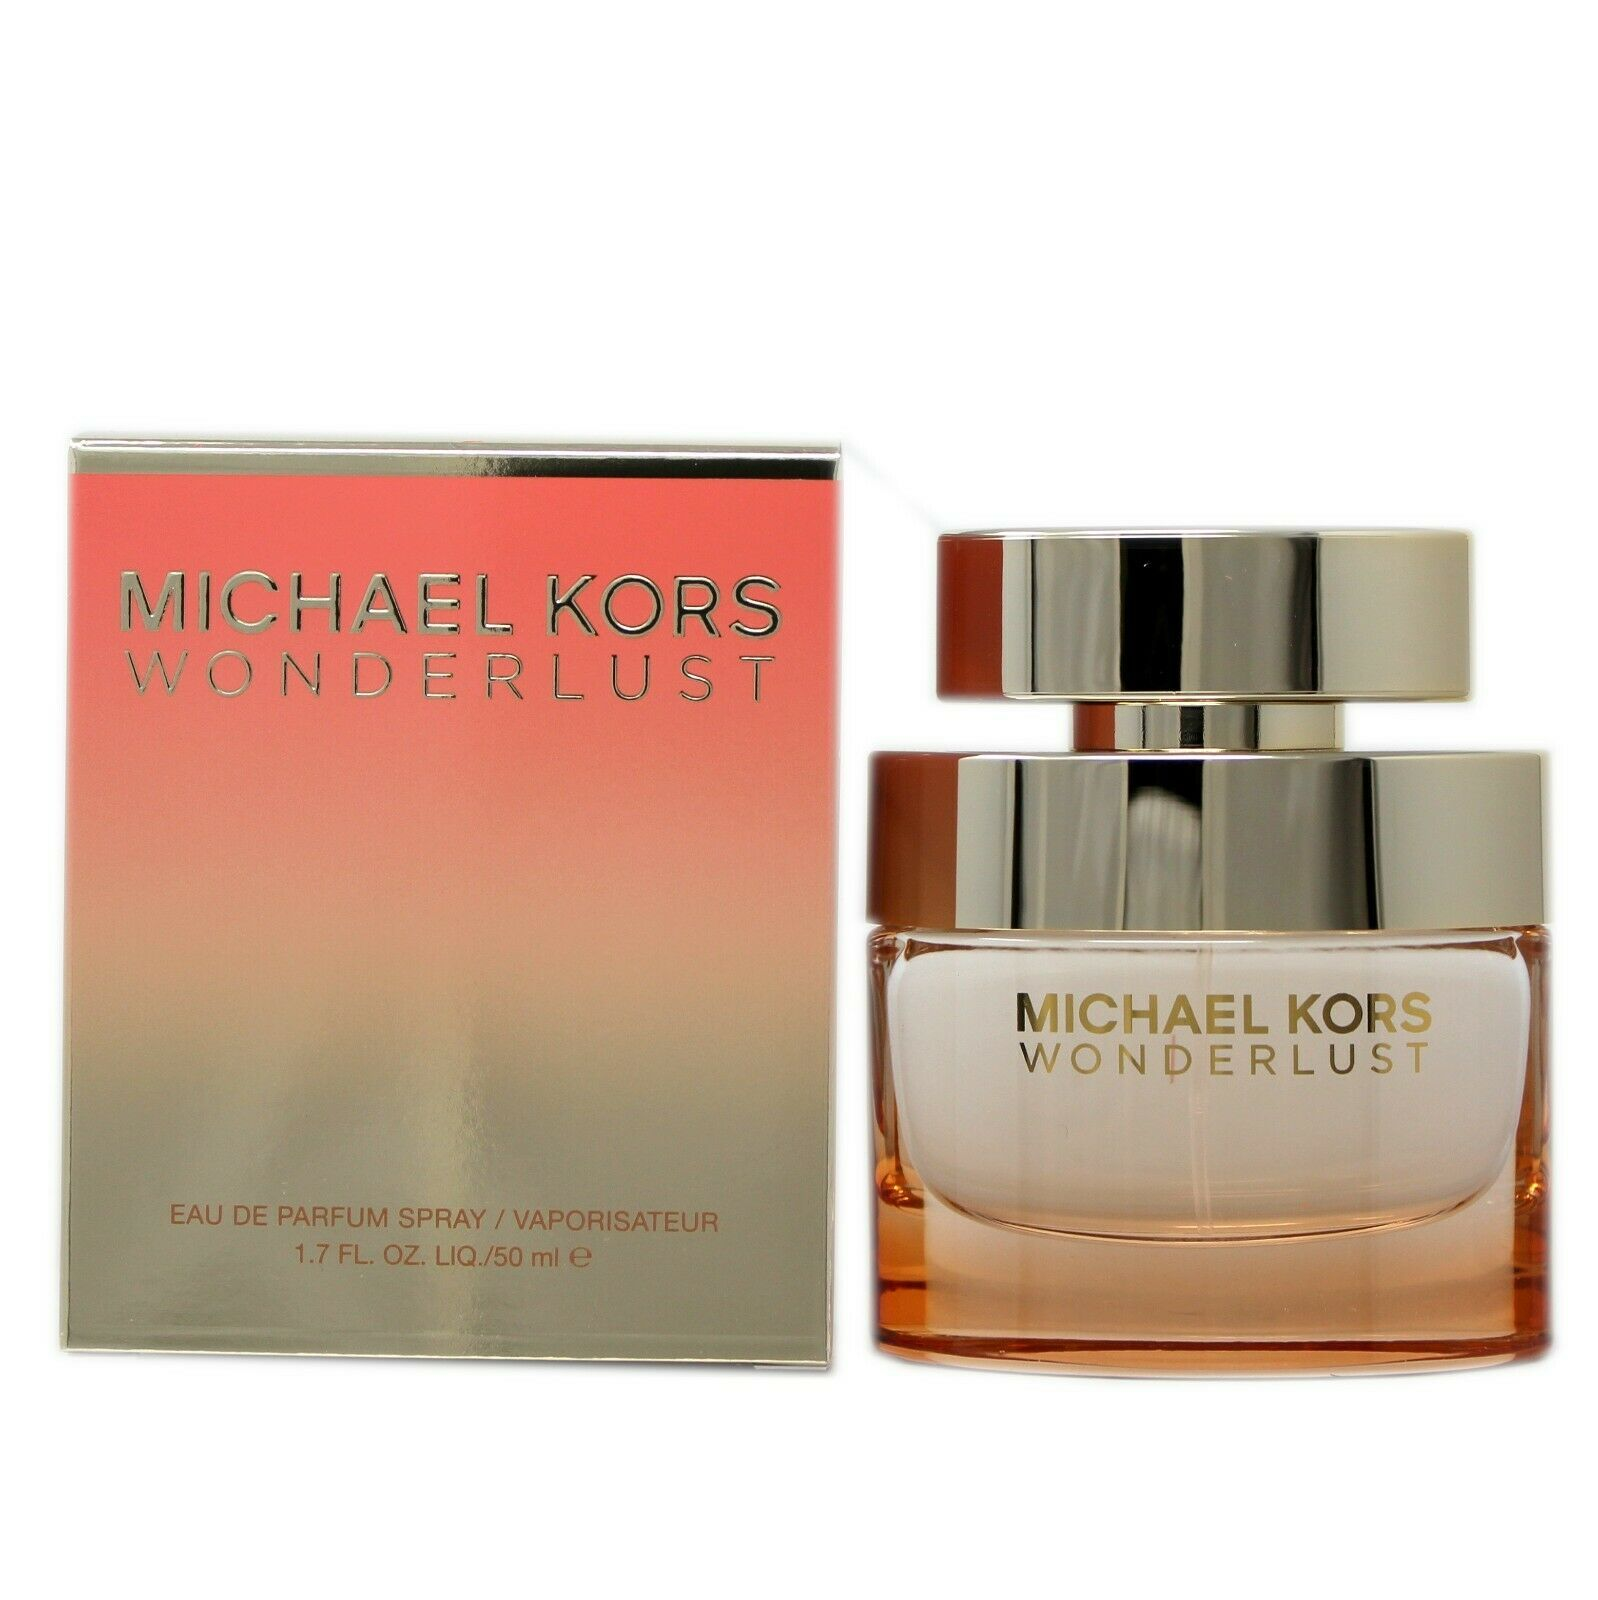 MICHAEL KORS WONDERLUST EAU DE PARFUM SPRAY 50 ML/1.7 FL.OZ. NIB - $64.35